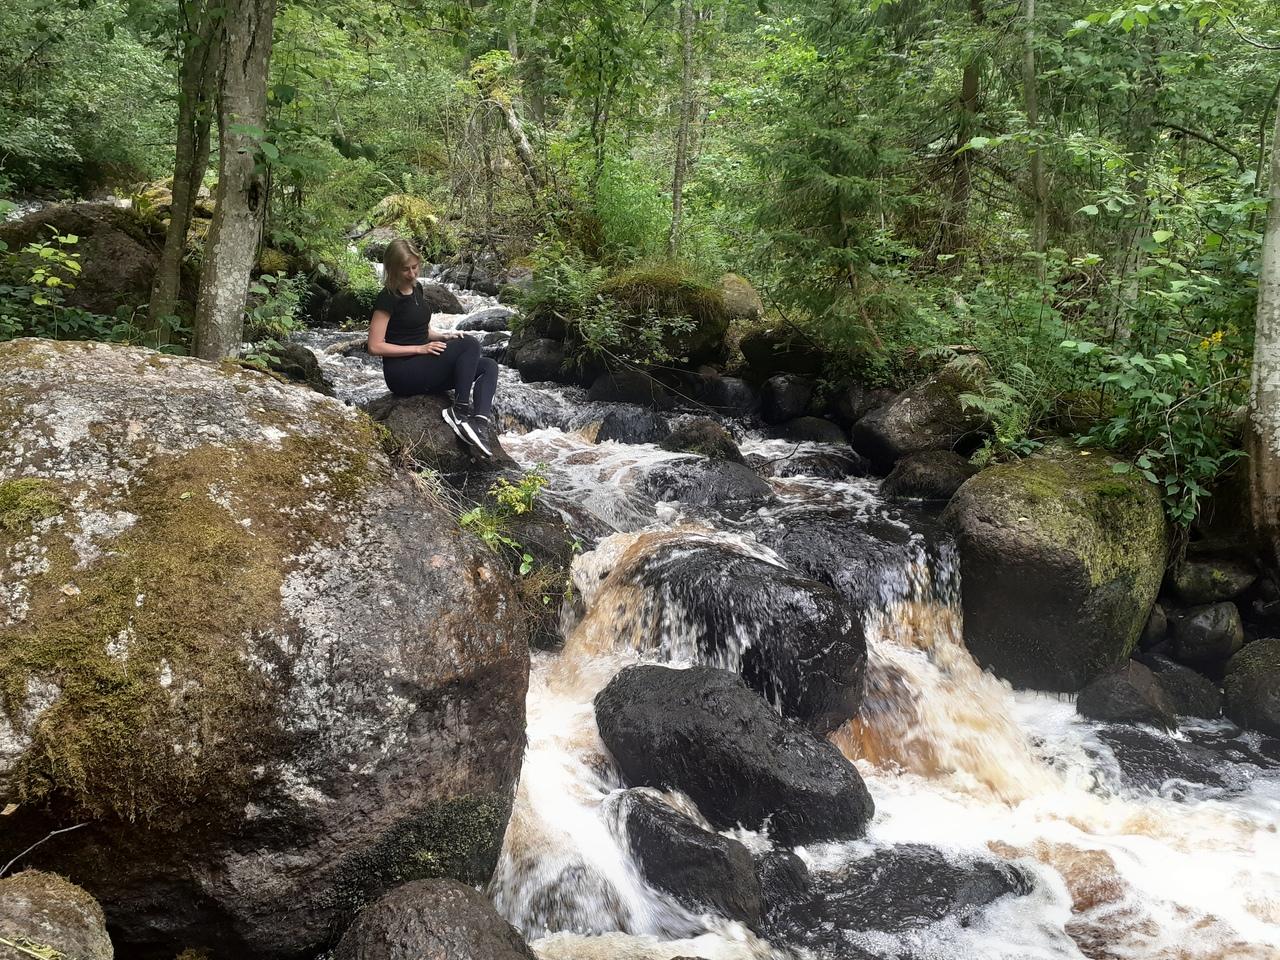 Куолемаярви-Тарасовское. Лесной водопад Миланакоски и прозрачное озеро.